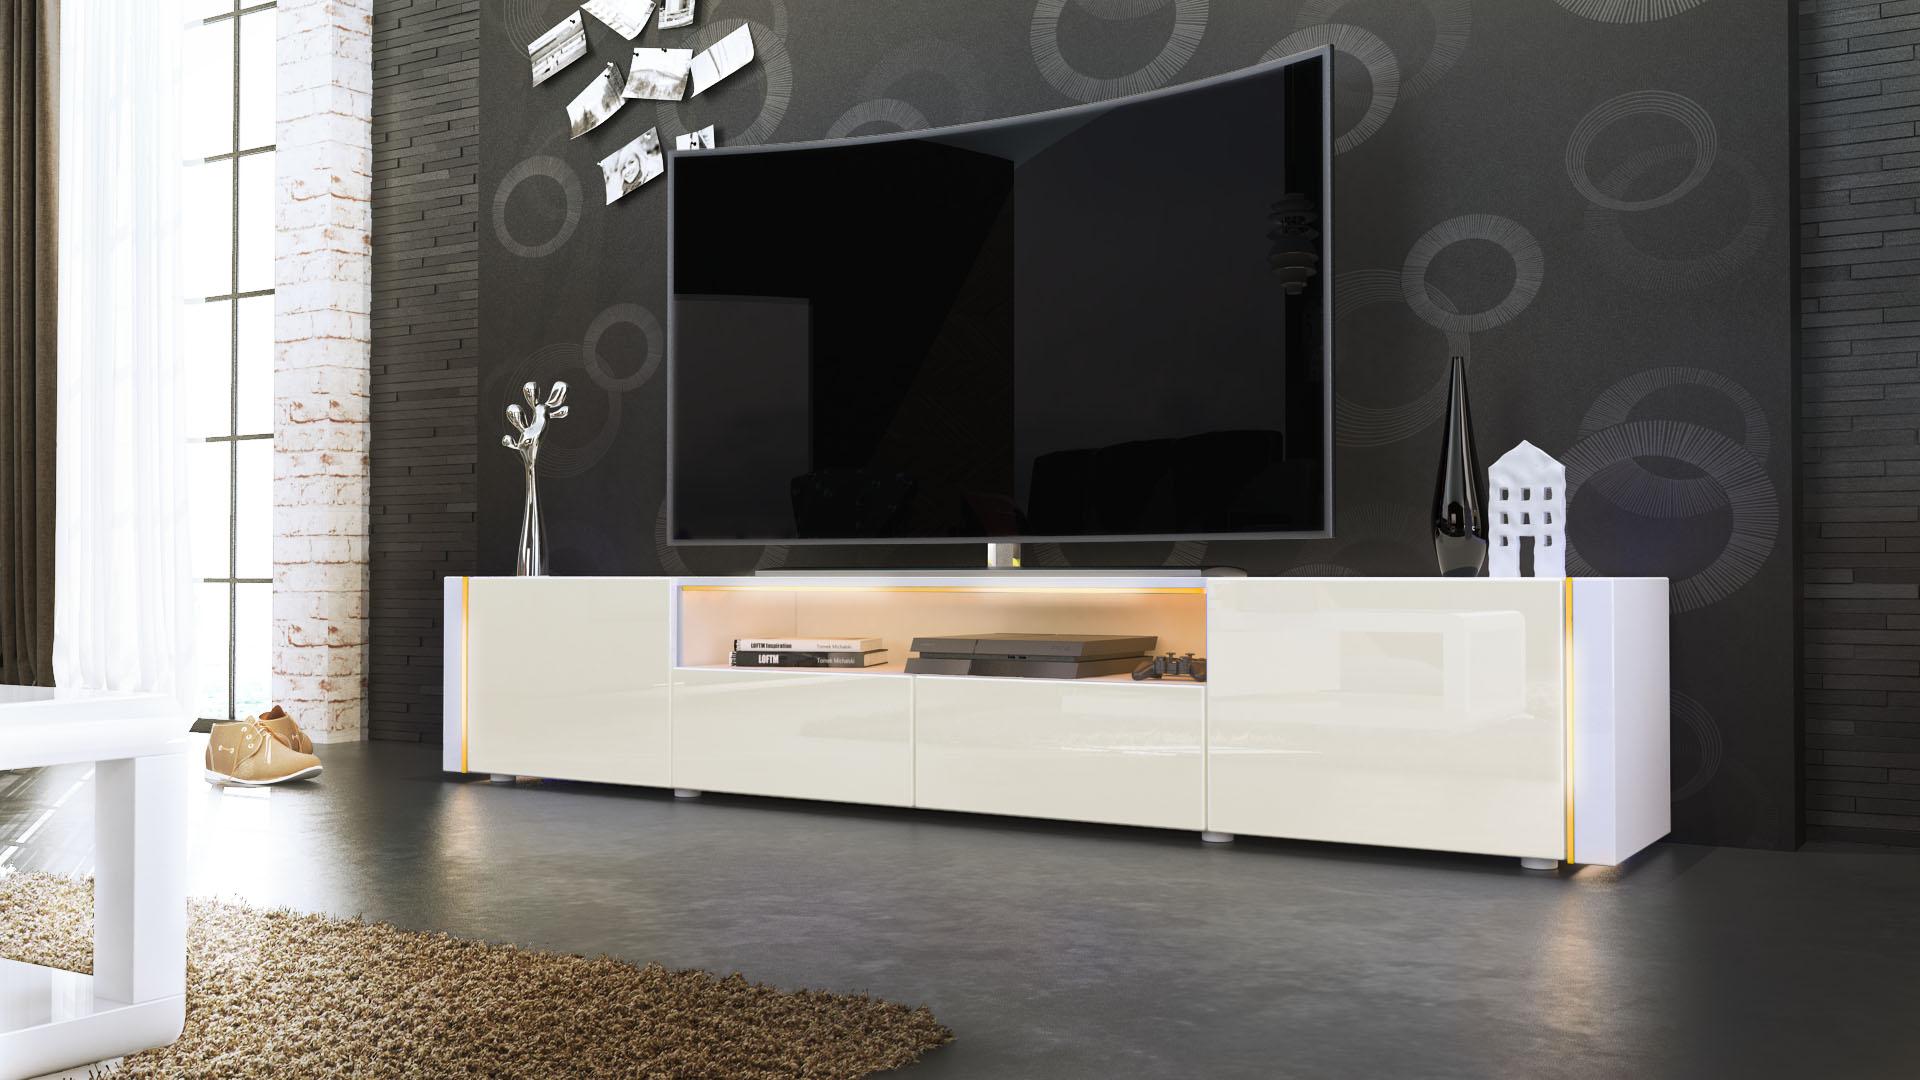 tv lowboard fernseh board schrank tisch m bel rack marino v2 wei hochglanz ebay. Black Bedroom Furniture Sets. Home Design Ideas